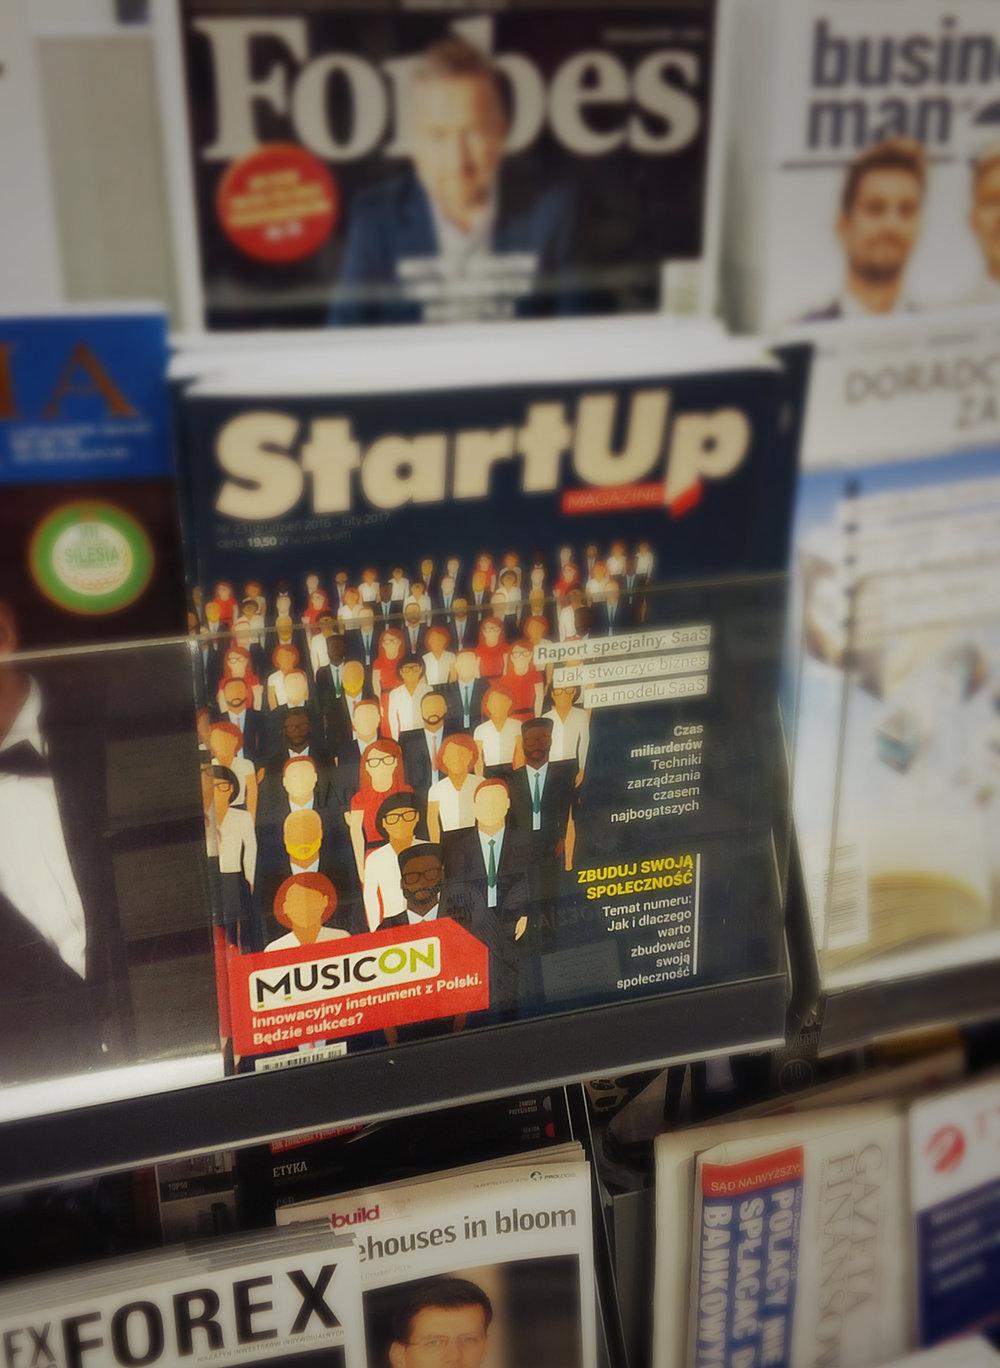 Musicon in Startup Magazine